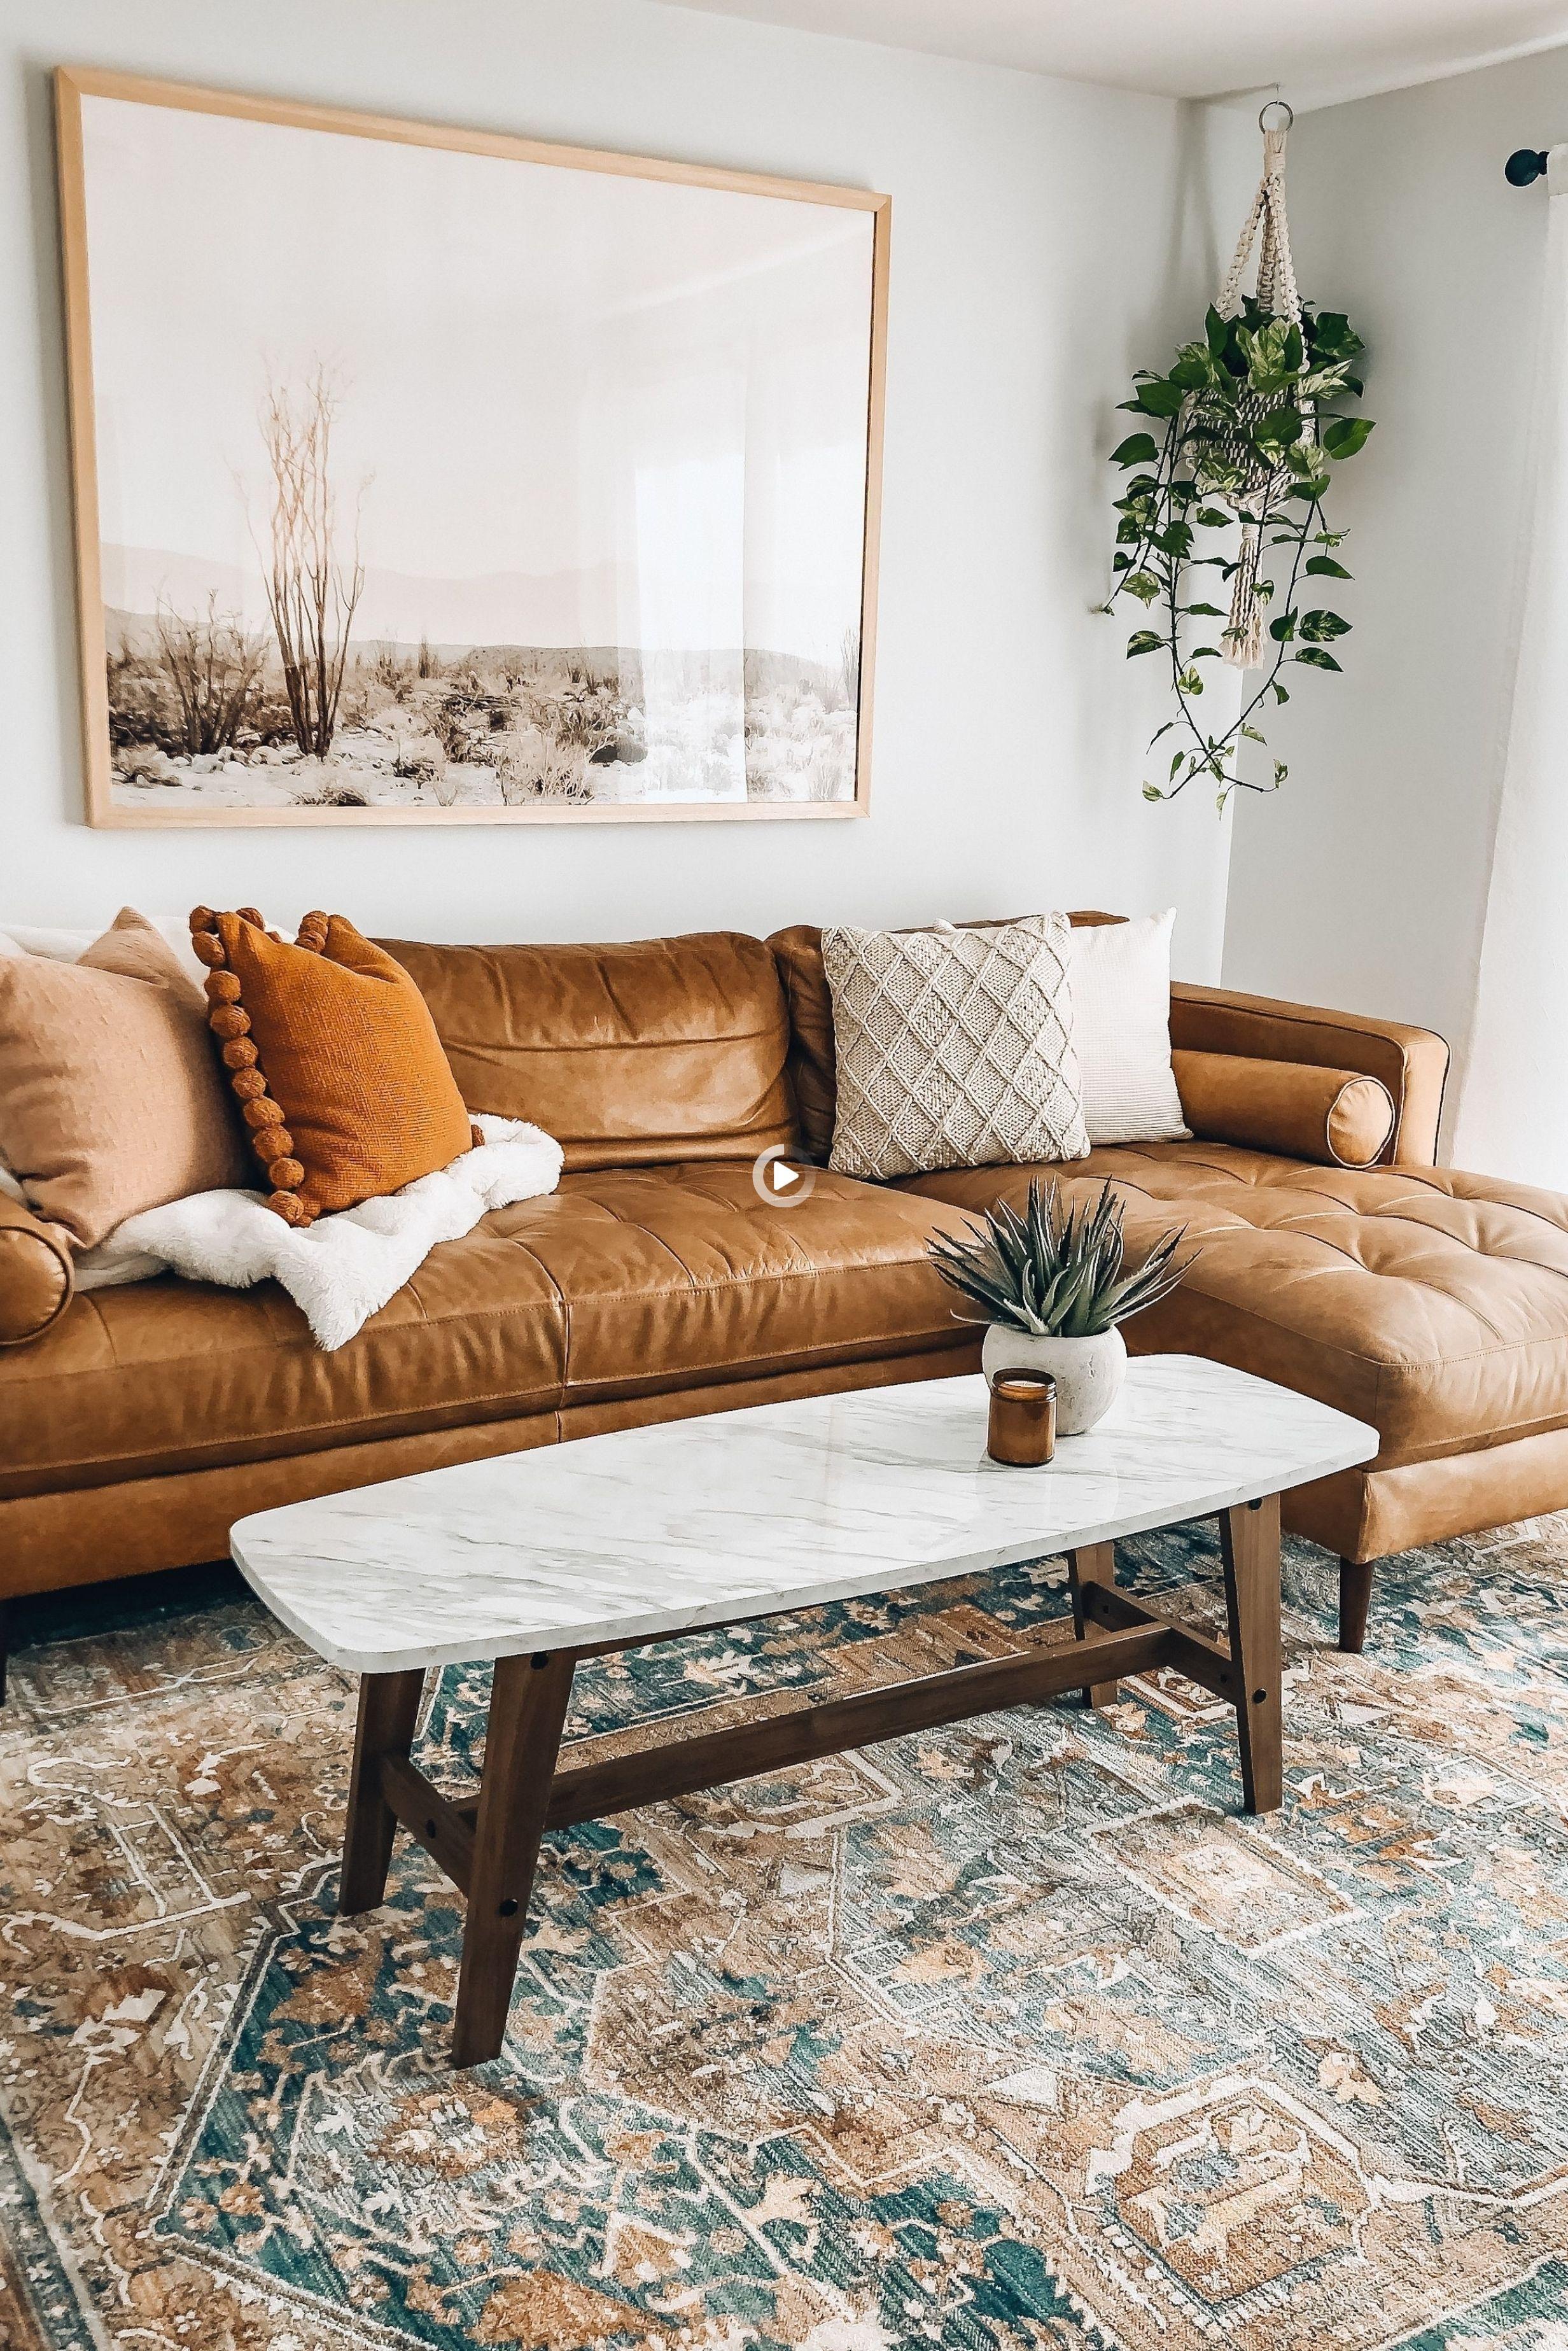 Simple Home Decor Ideas For Your Boho Living Room In 2021 Home Decor Sets Bathroom Decor Colors Boho Living Room Decor